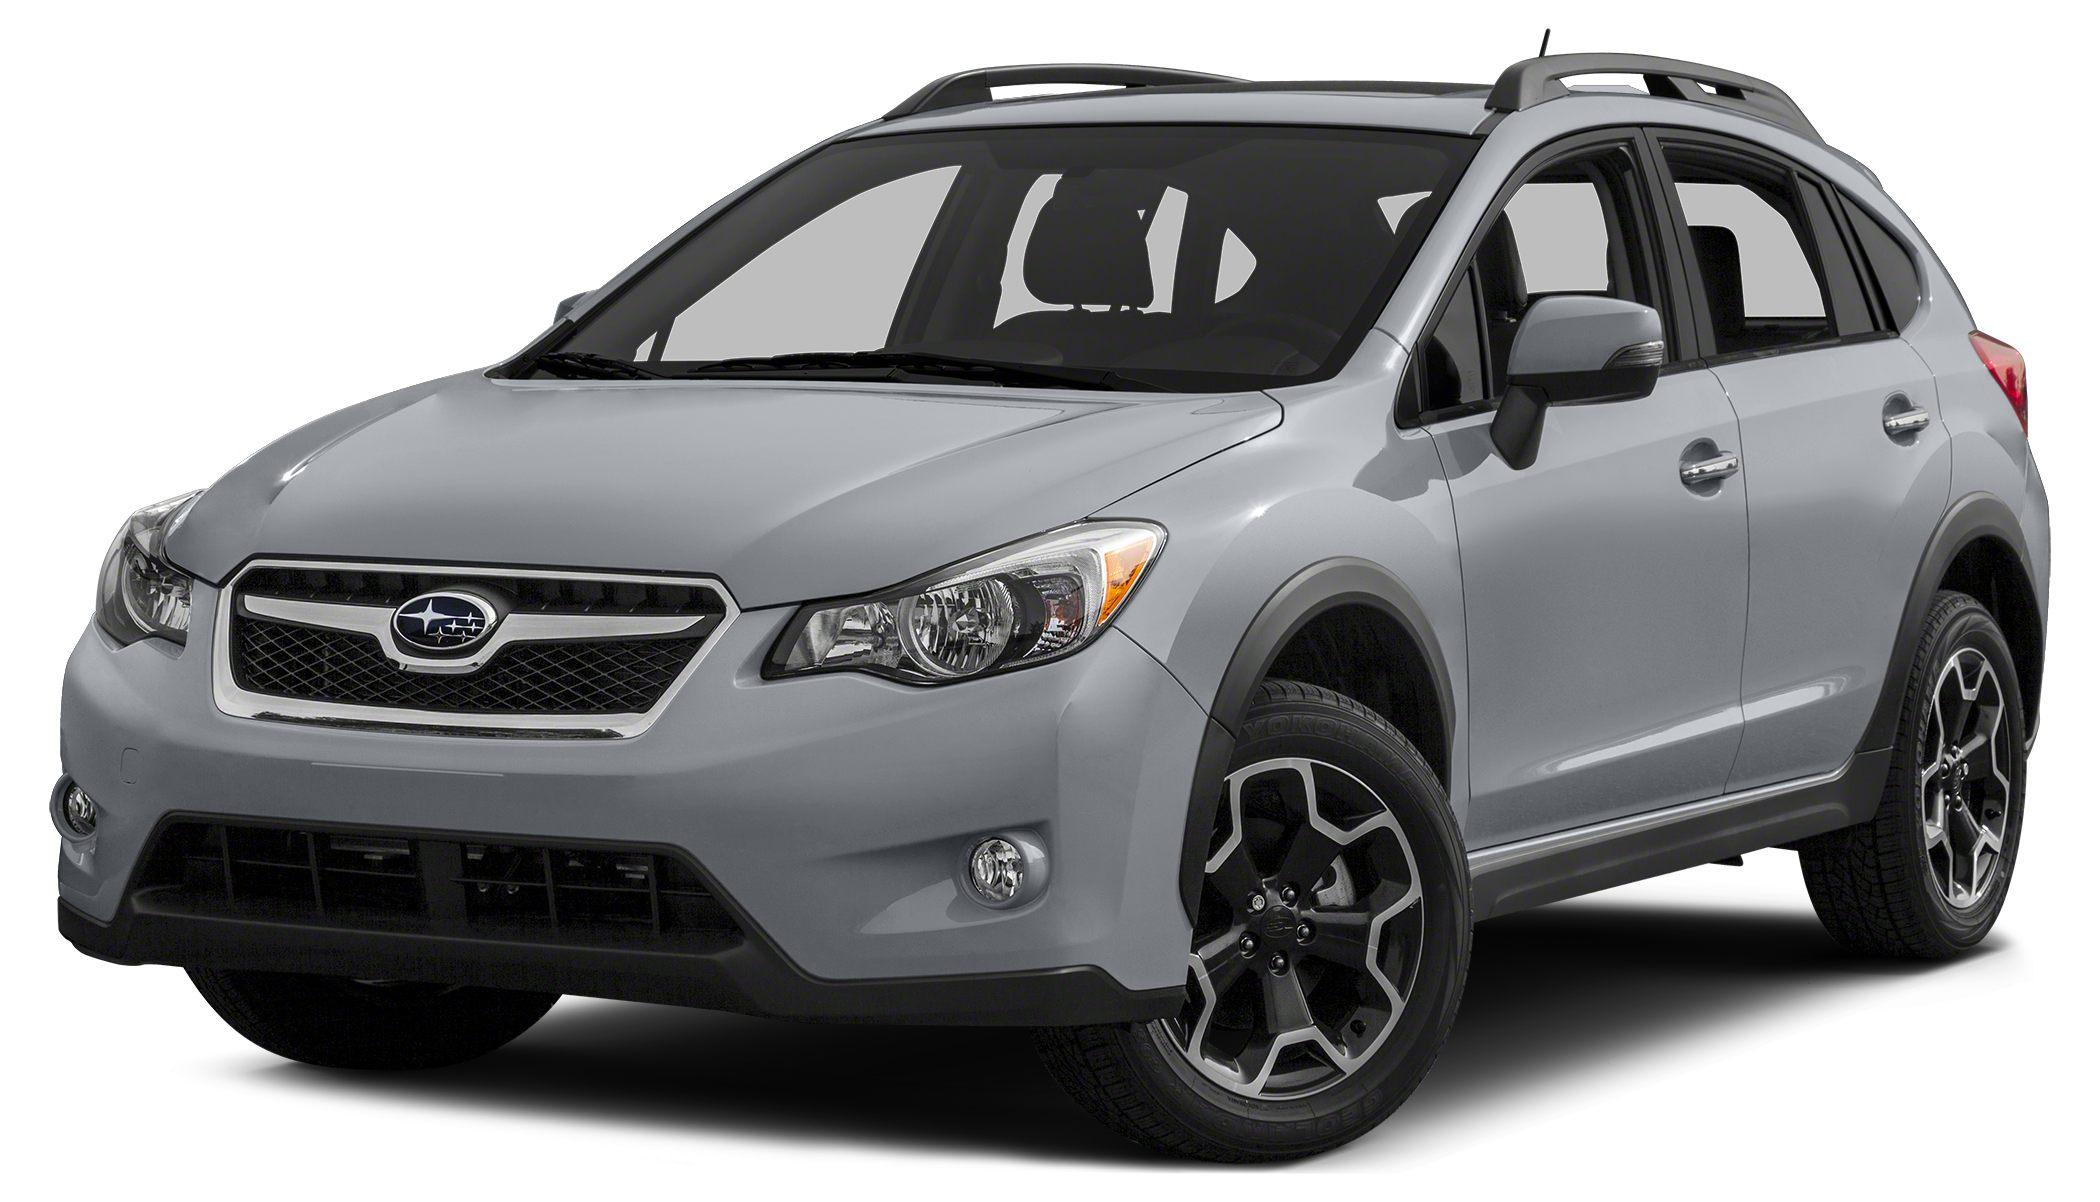 2015 Subaru XV Crosstrek 20i Premium Miles 0Color Ice Silver Metallic Stoc